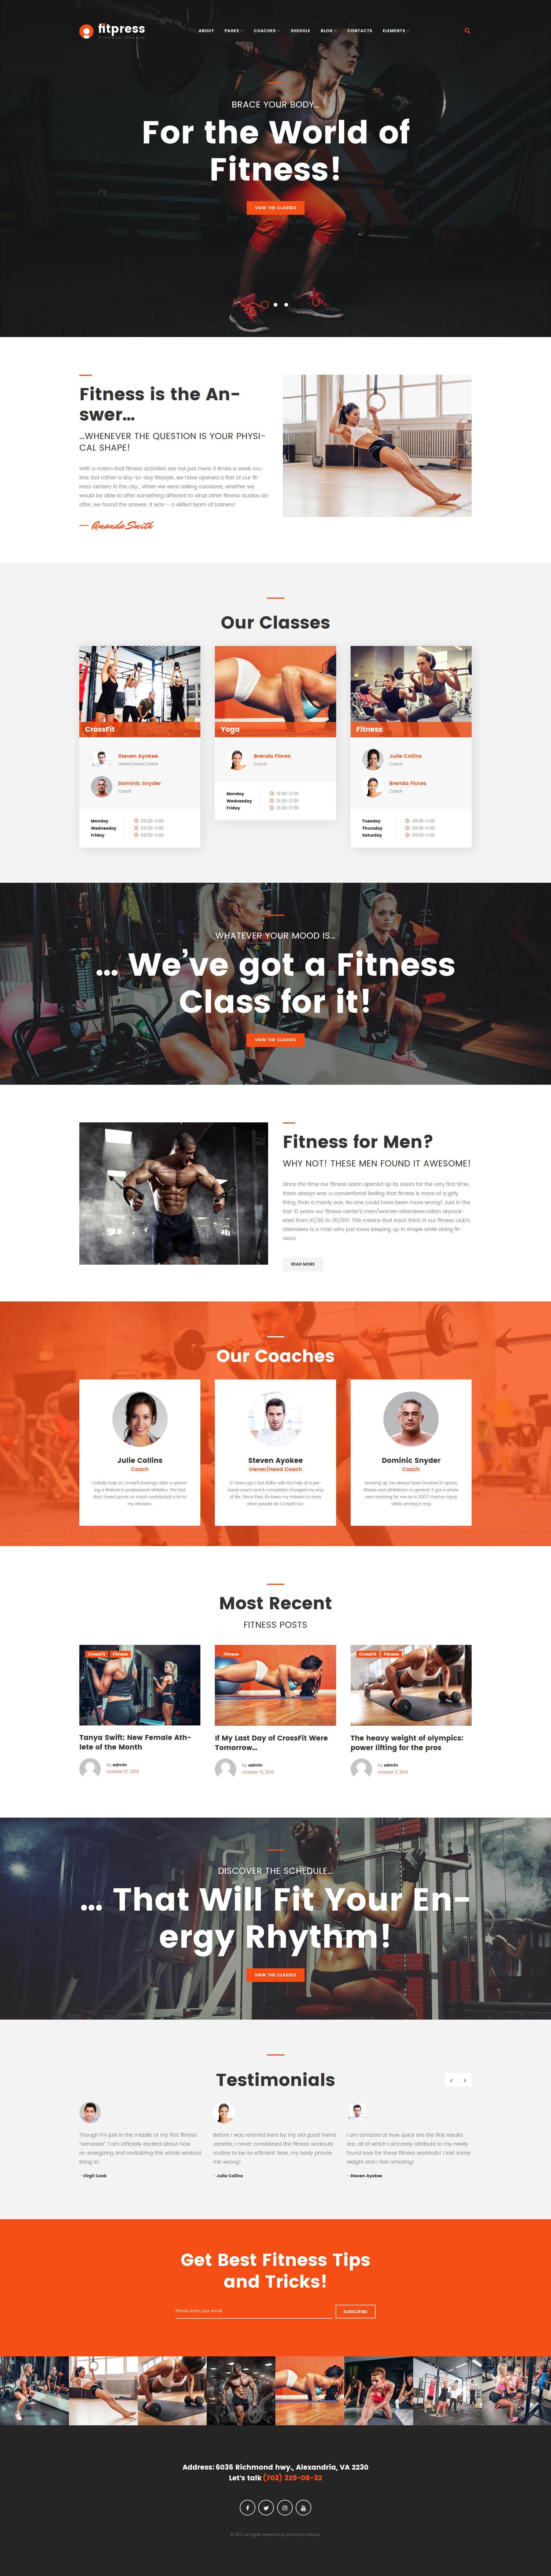 Fitpress - Fitness & Gym WordPress Theme | Pinterest | Wordpress ...